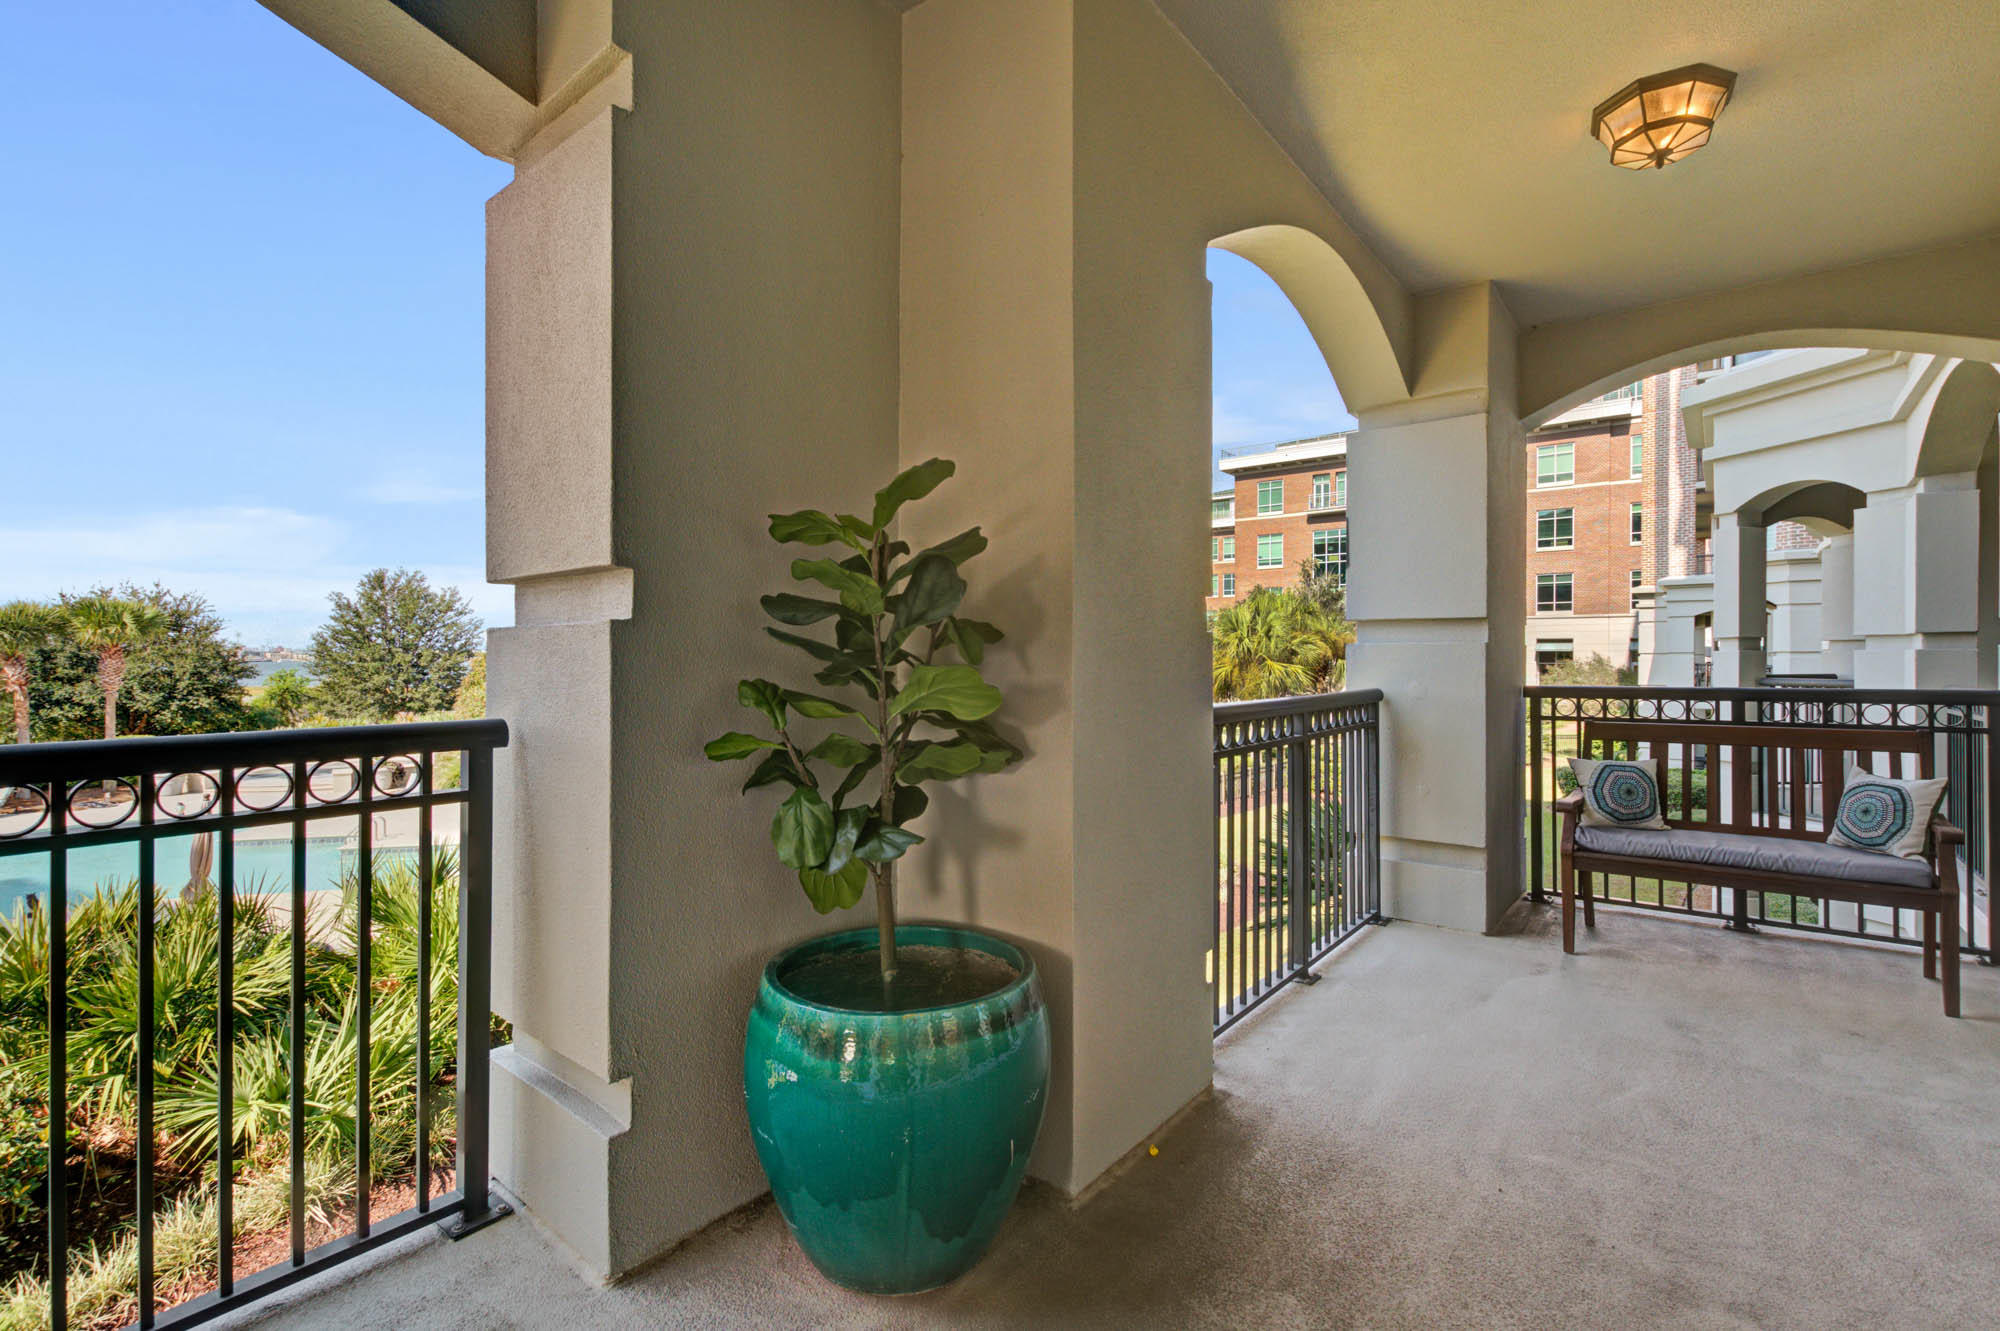 Renaissance On Chas Harbor Homes For Sale - 125 Plaza, Mount Pleasant, SC - 2